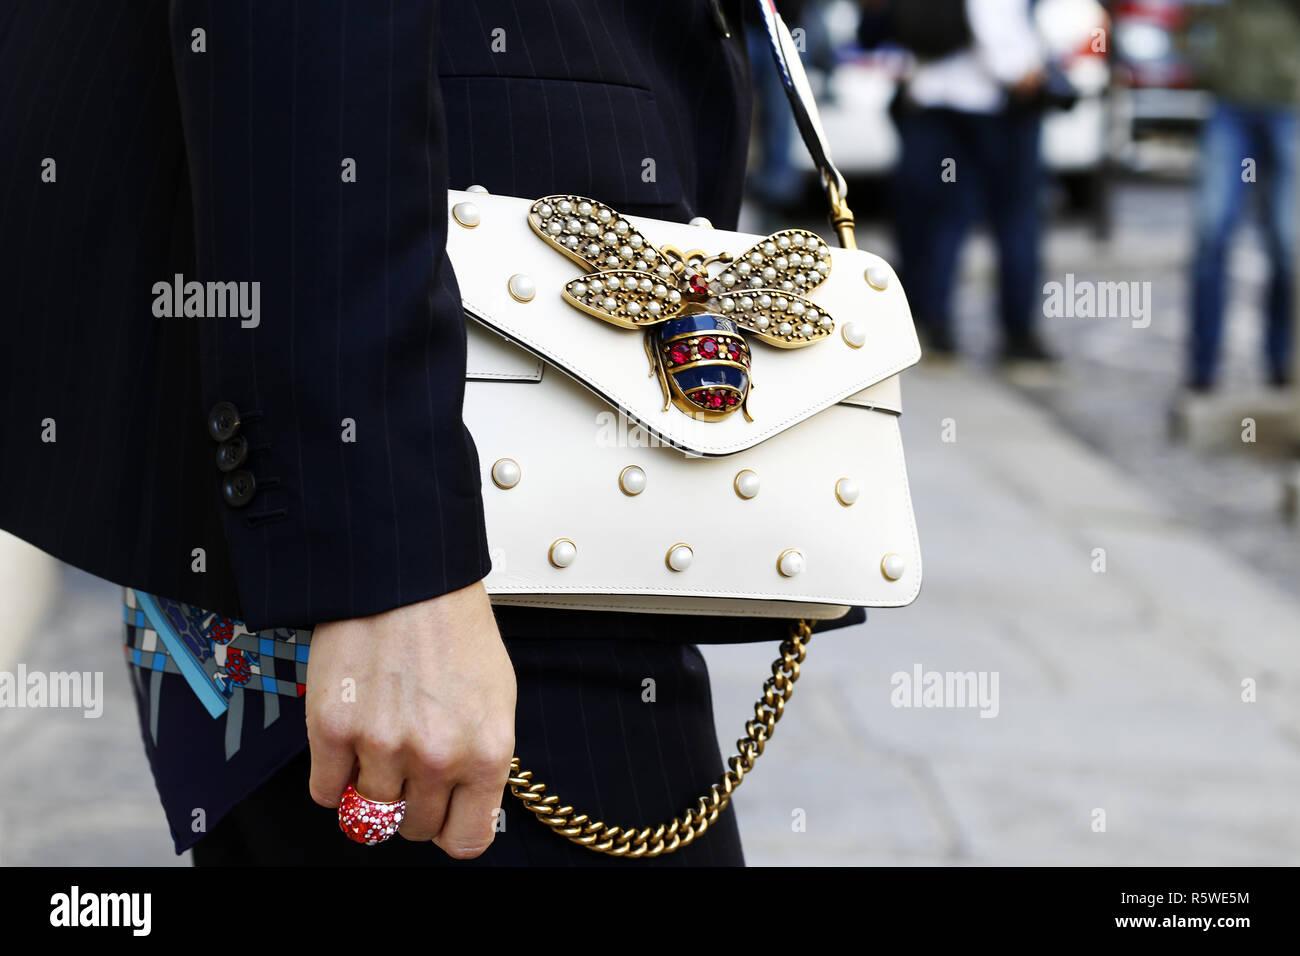 25e3b309131 Bee Gucci Bag - Paris Fashion Week RTW SS 2019 - Paris - France ...